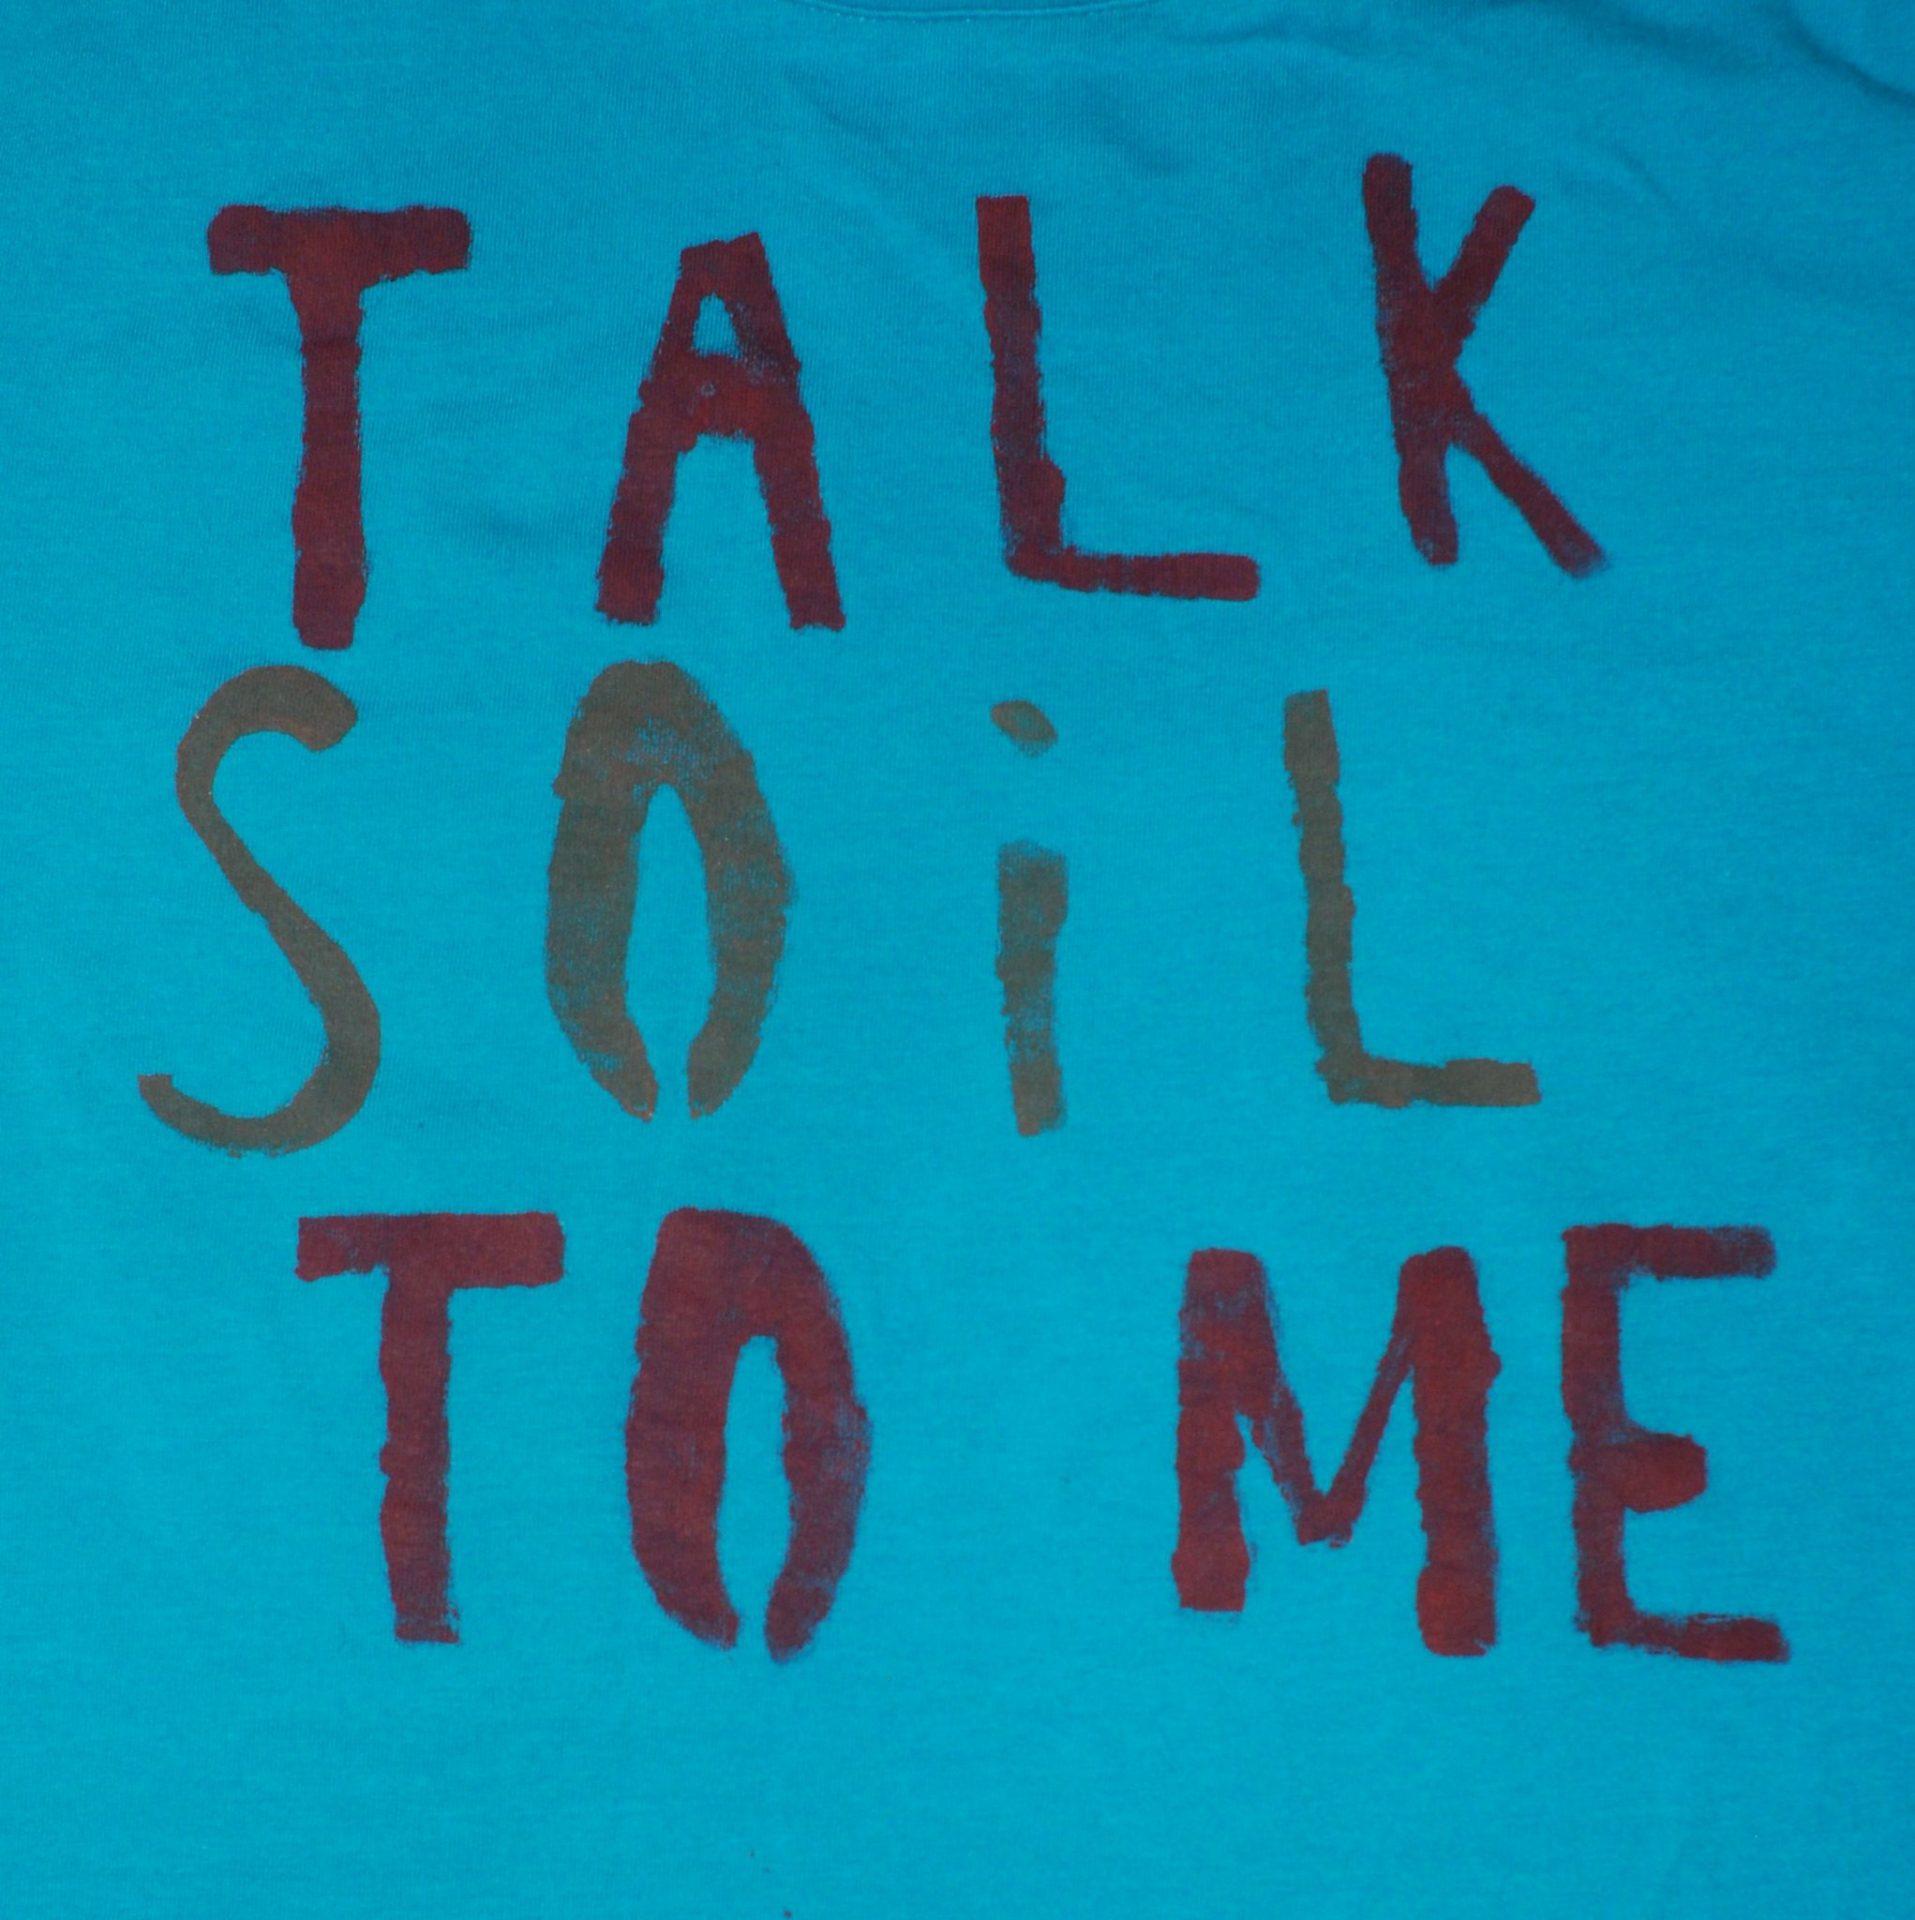 talksoil